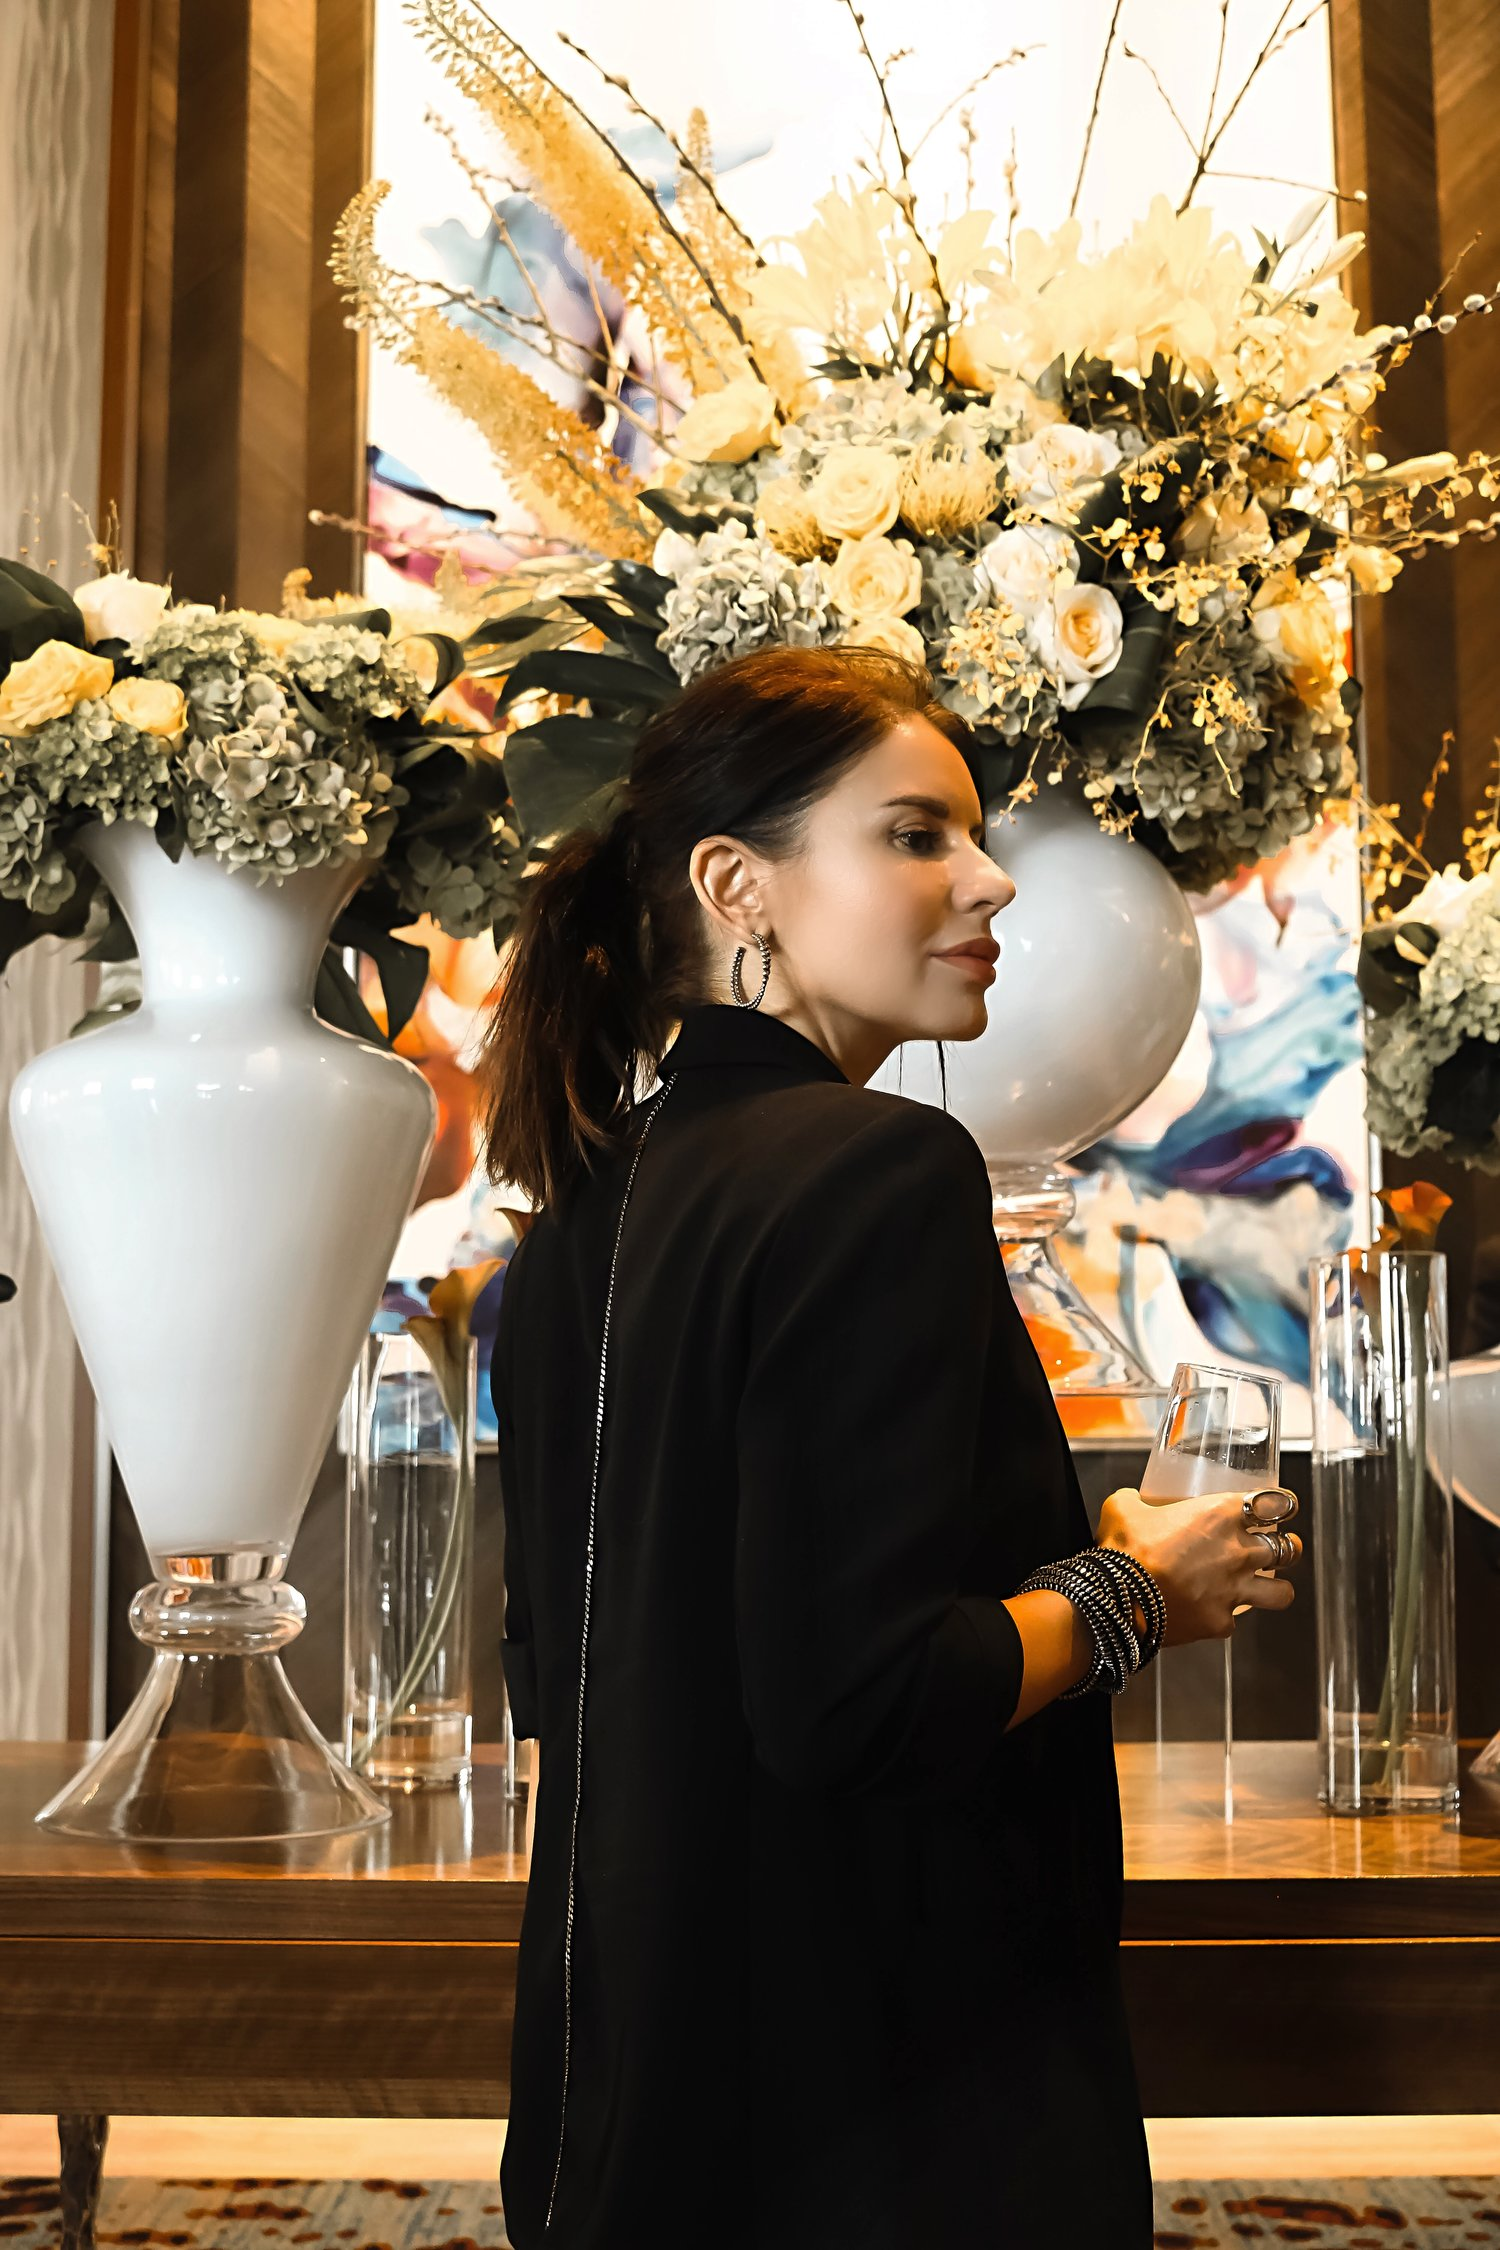 Live Hotel Casino Floral Decor Hotel Lobby Isabel Alexander